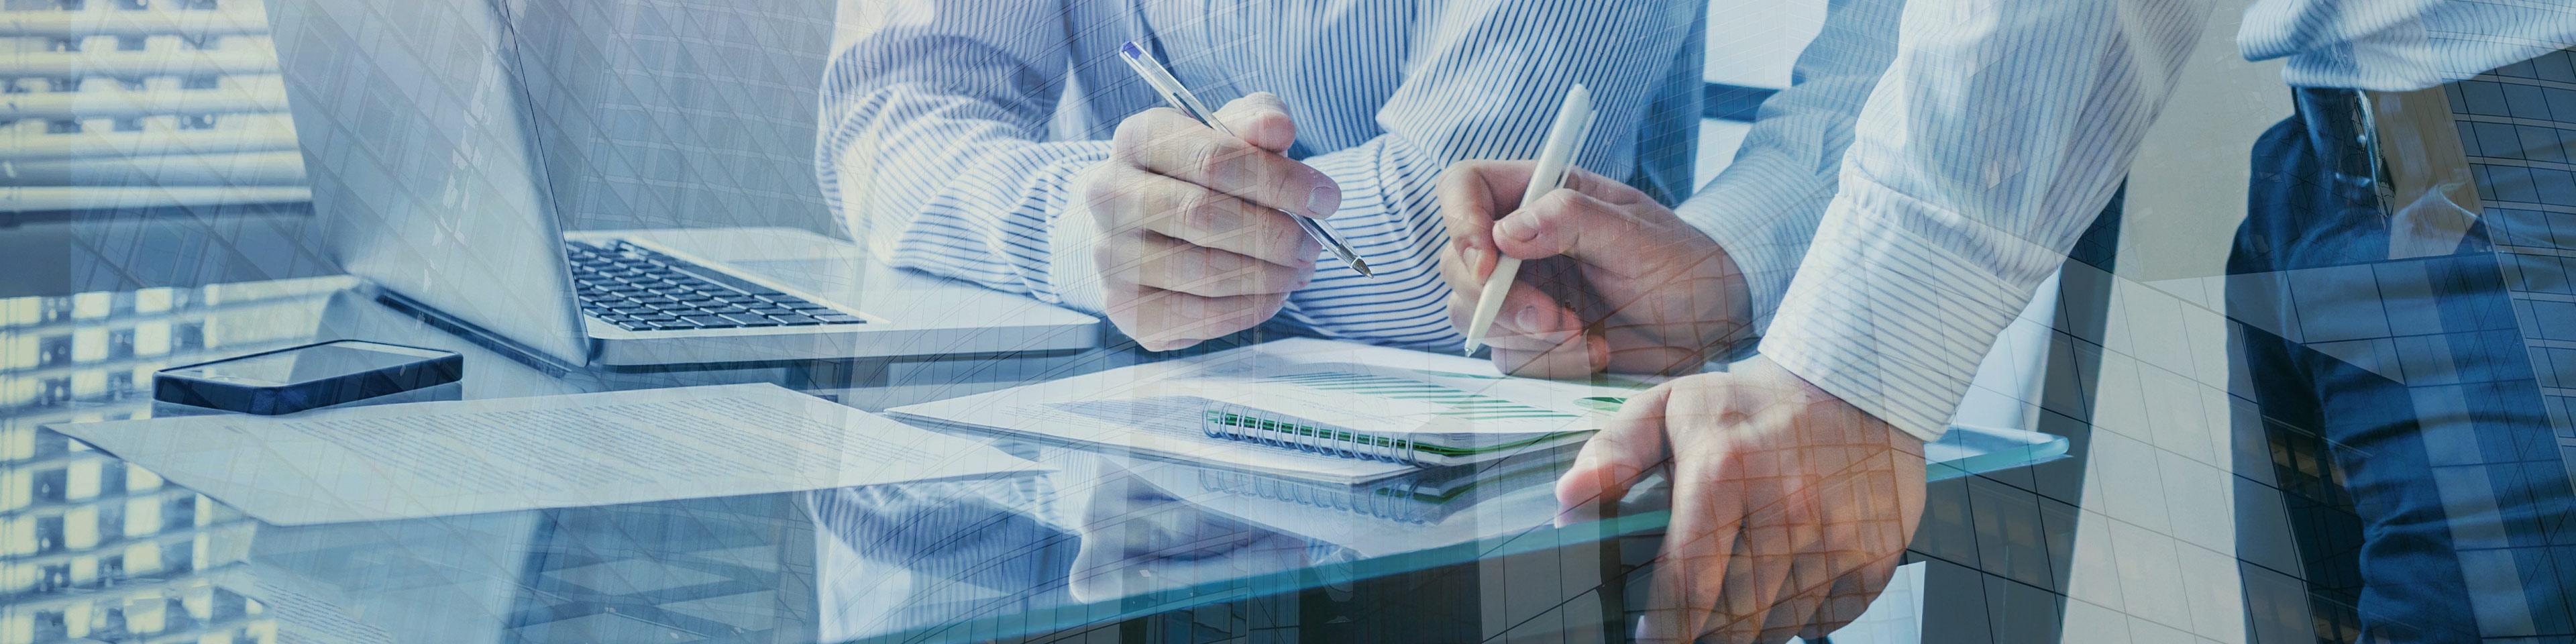 Corporate Counsel nell'era digitale